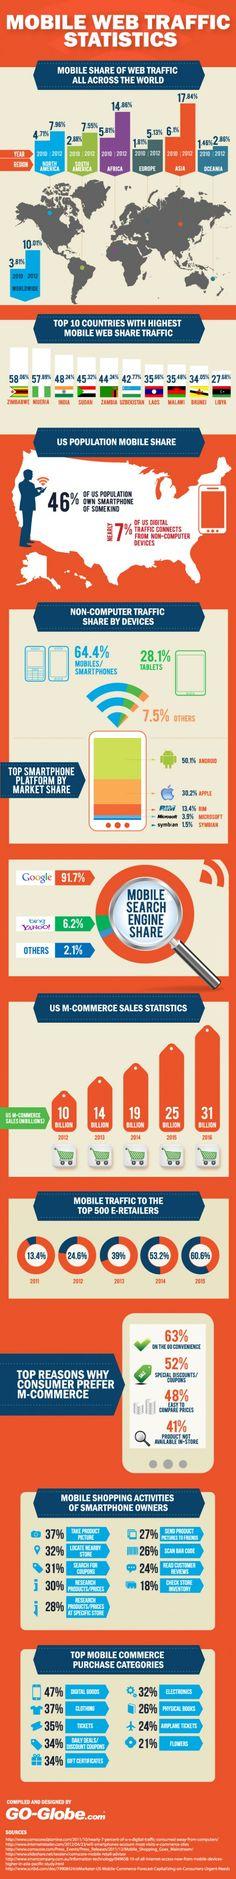 Mobile Web Traffic Statistics Infographic